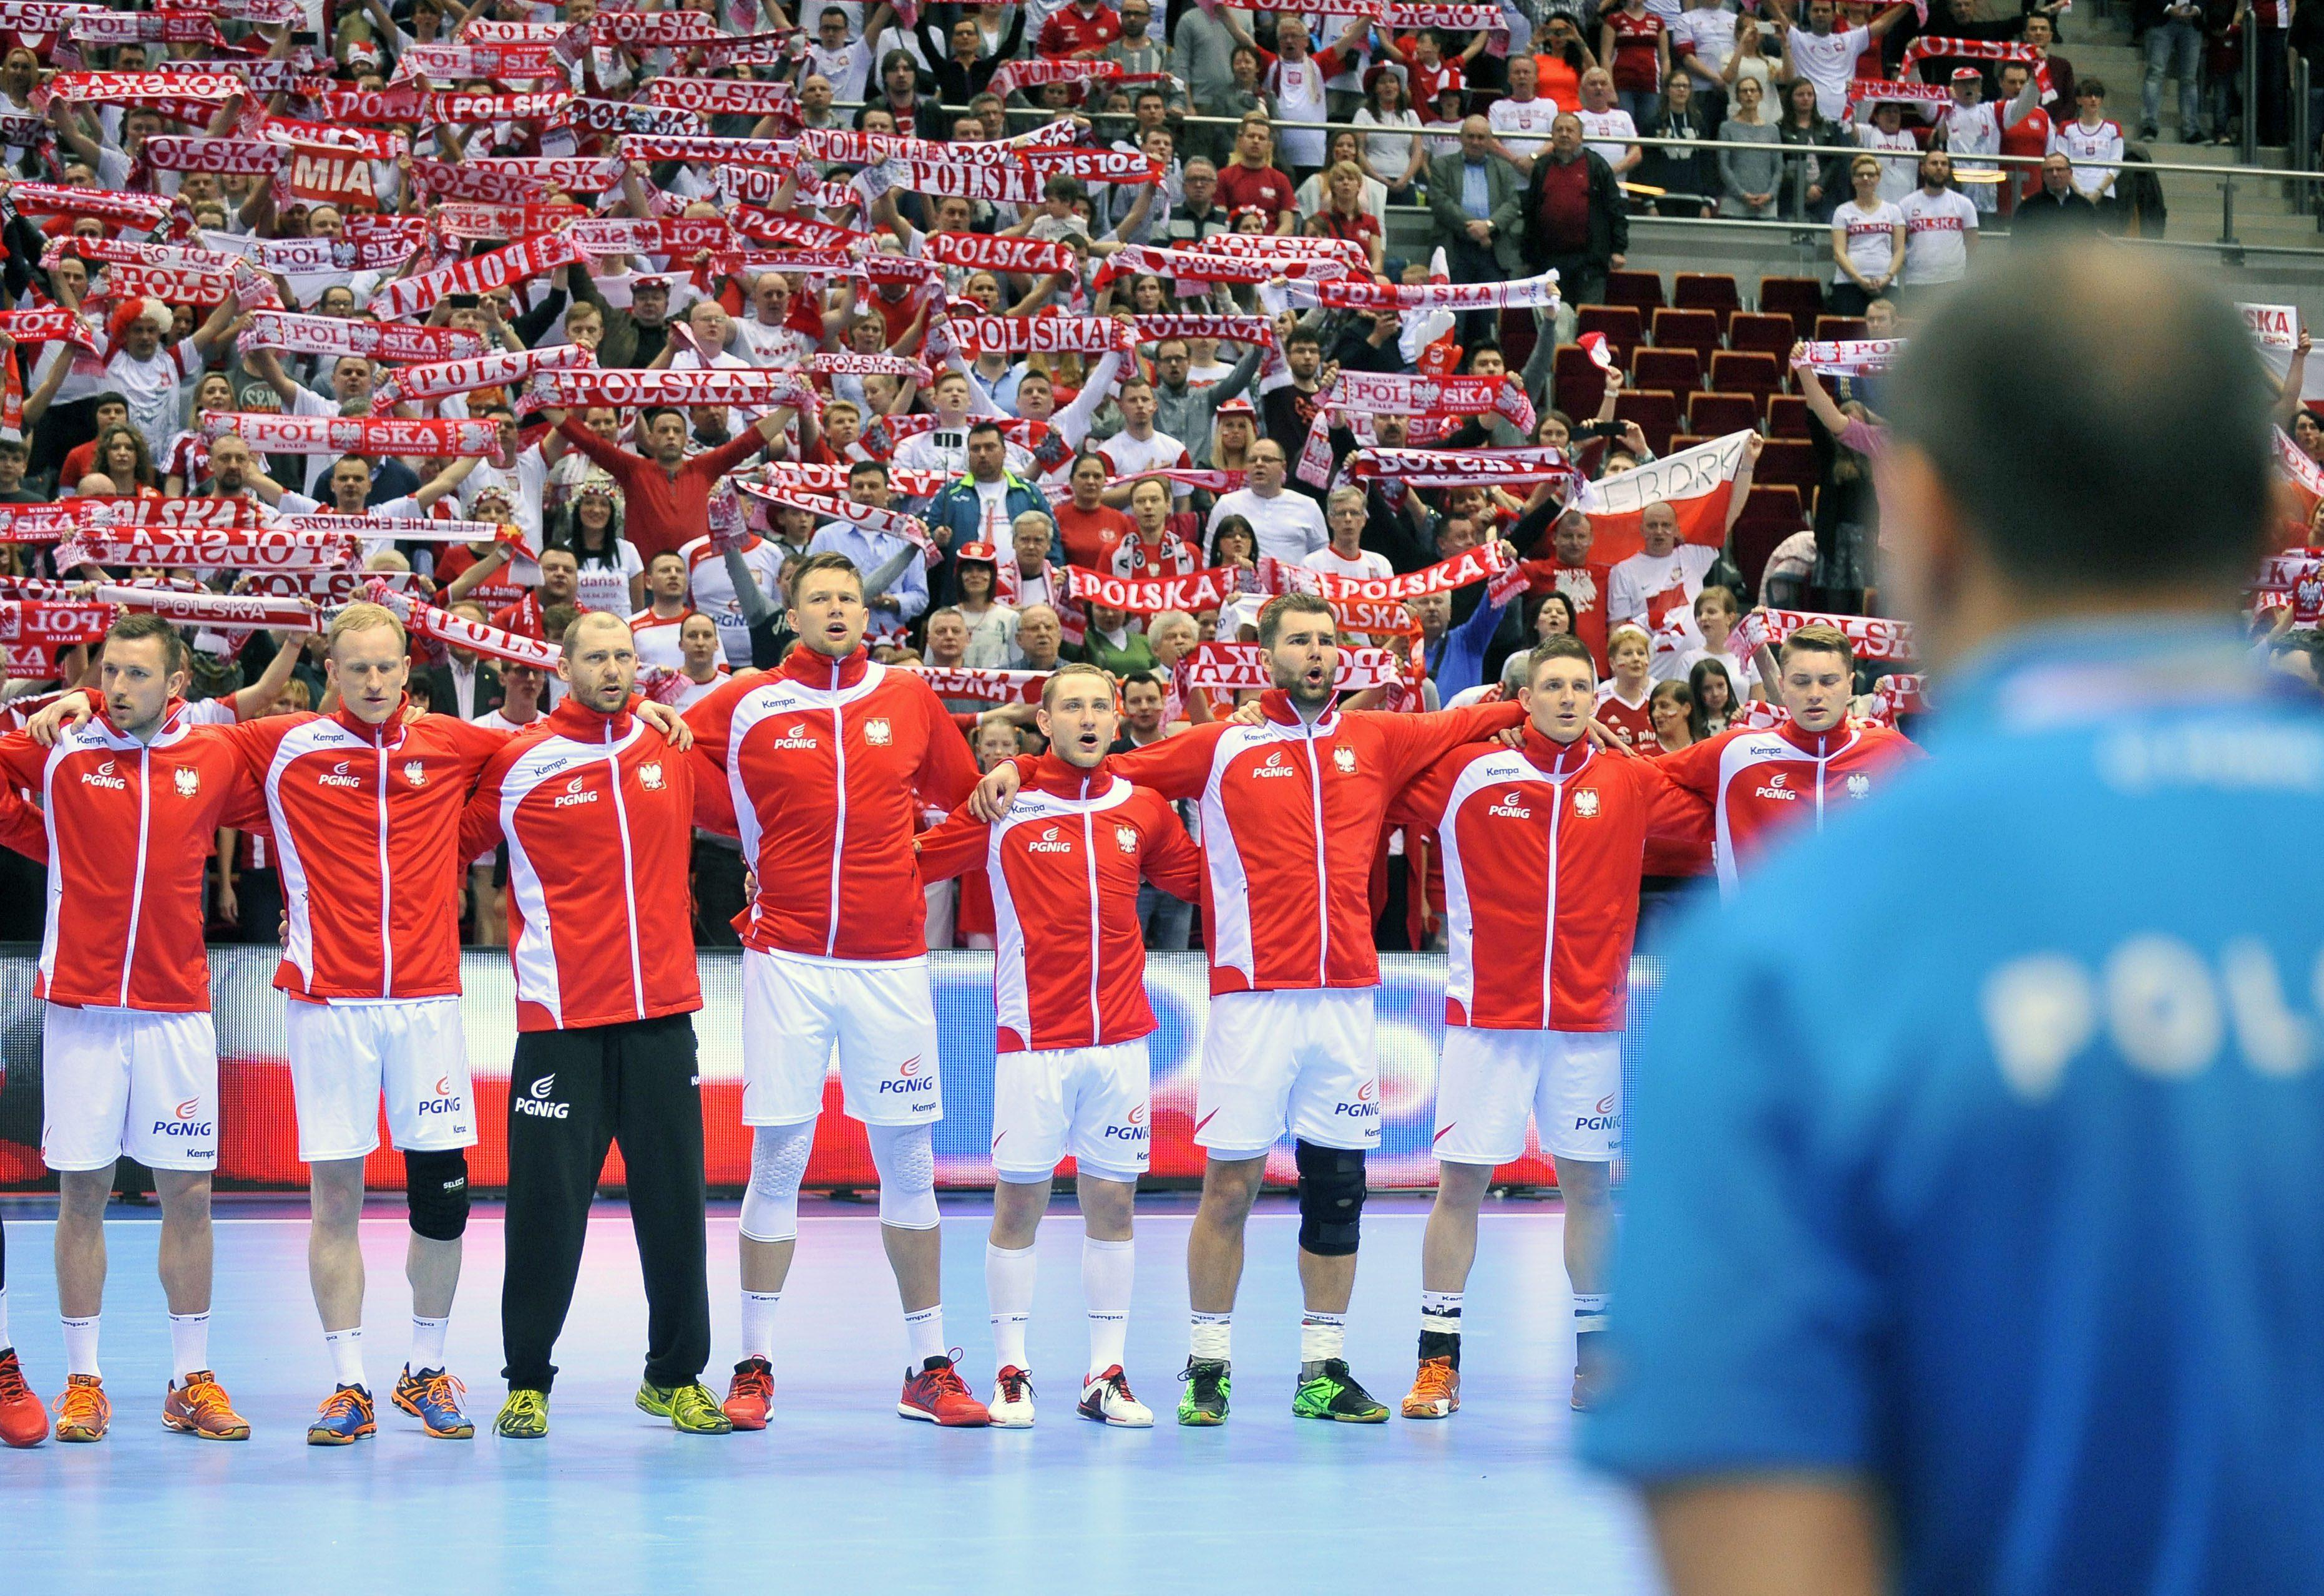 Polska - Tunezja (Poland - Tunisia)